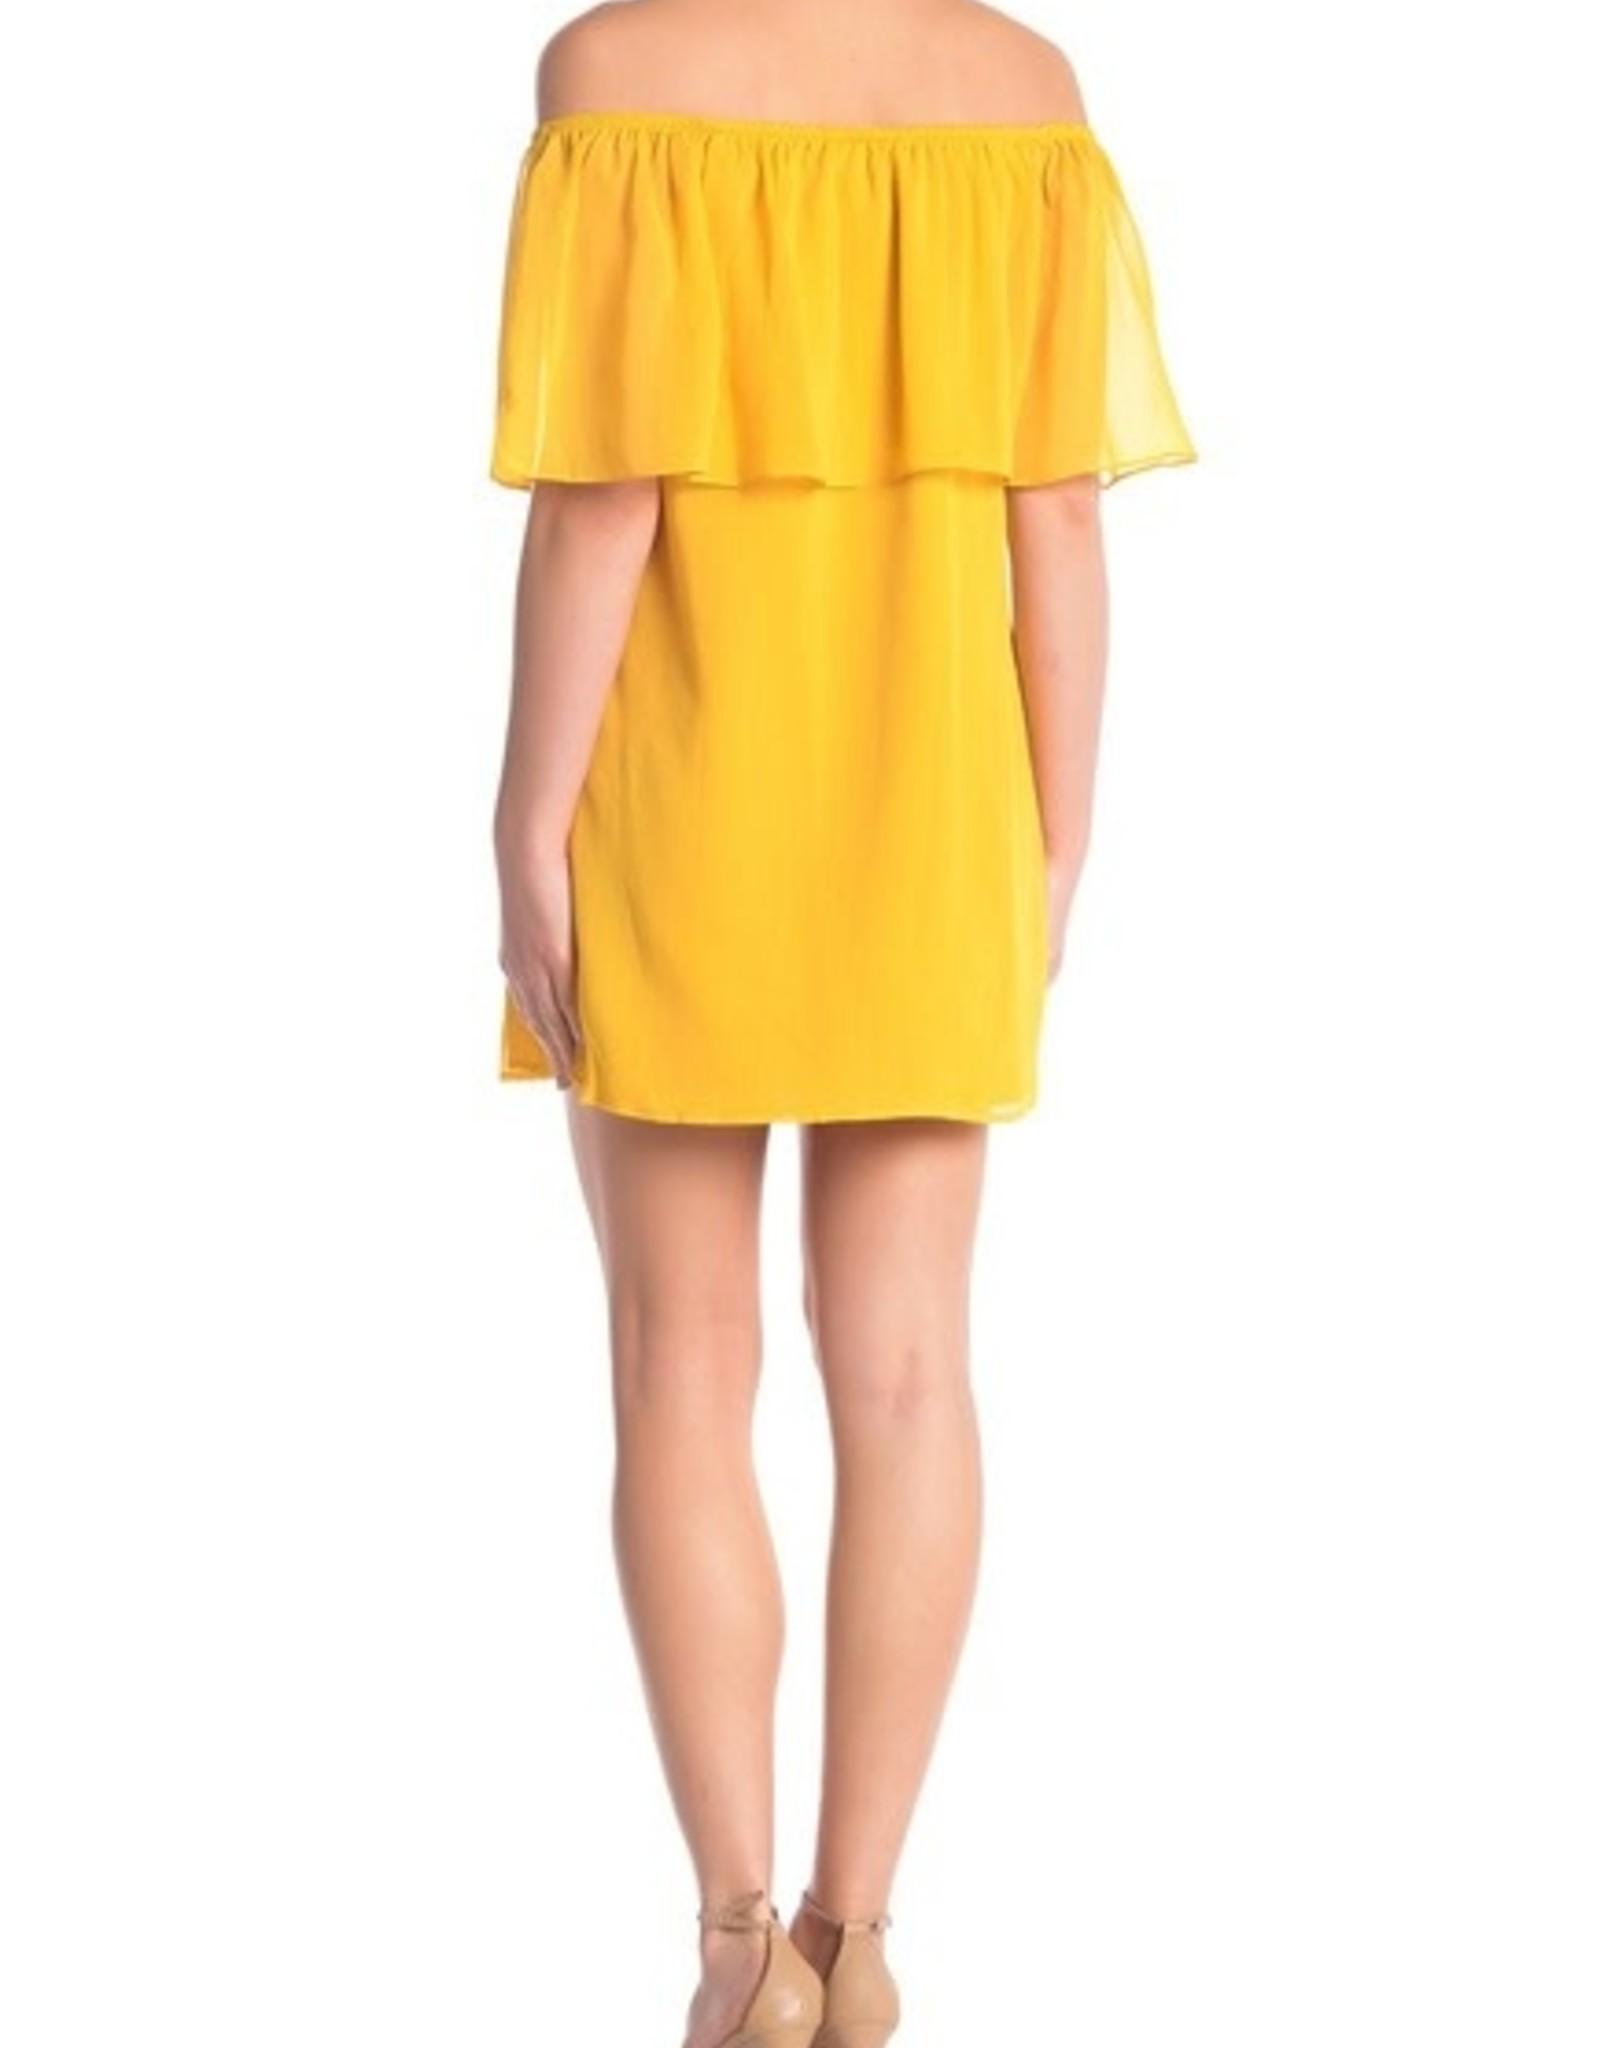 BB Dakota Off-the-Shoulder Mimosa Ruffle Dress